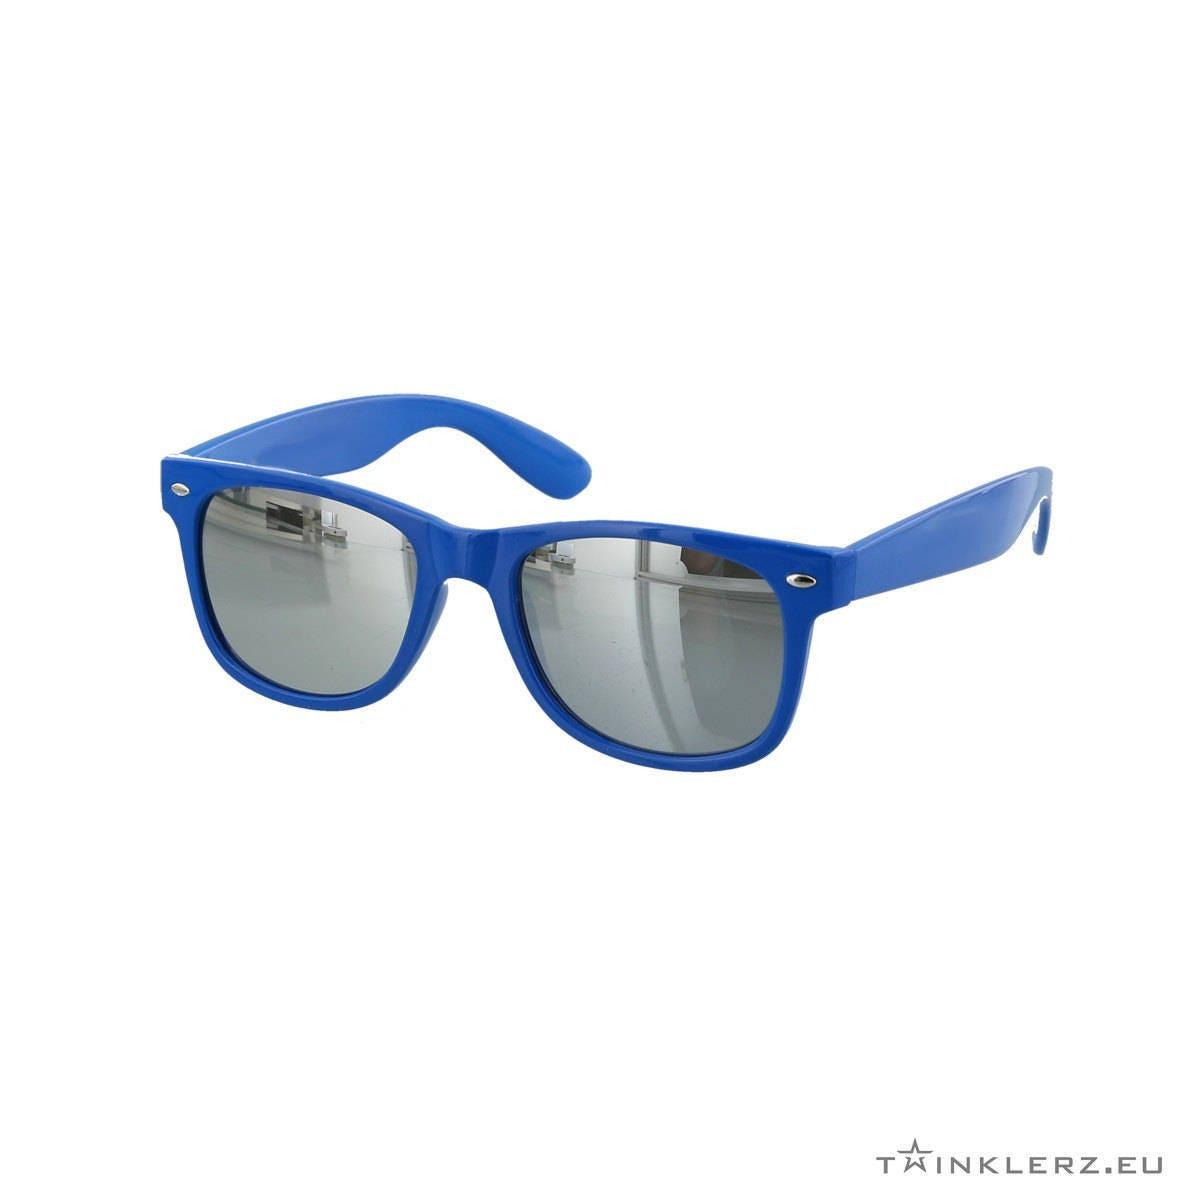 Custom Sunglasses Beach Wedding Personalized Favors Bachelorette Parties